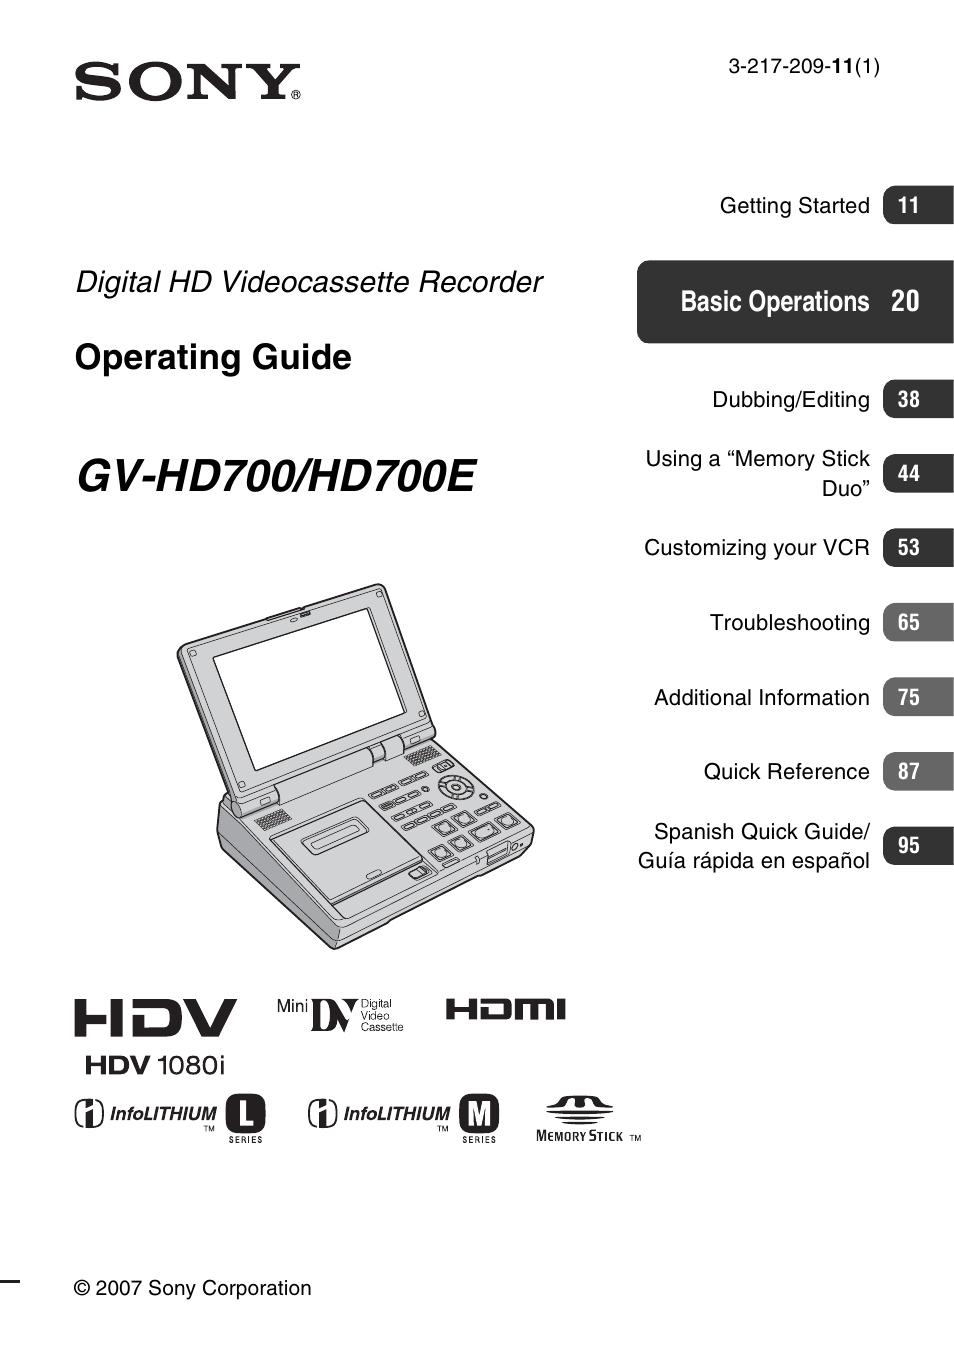 GV-HD700 MANUAL PDF